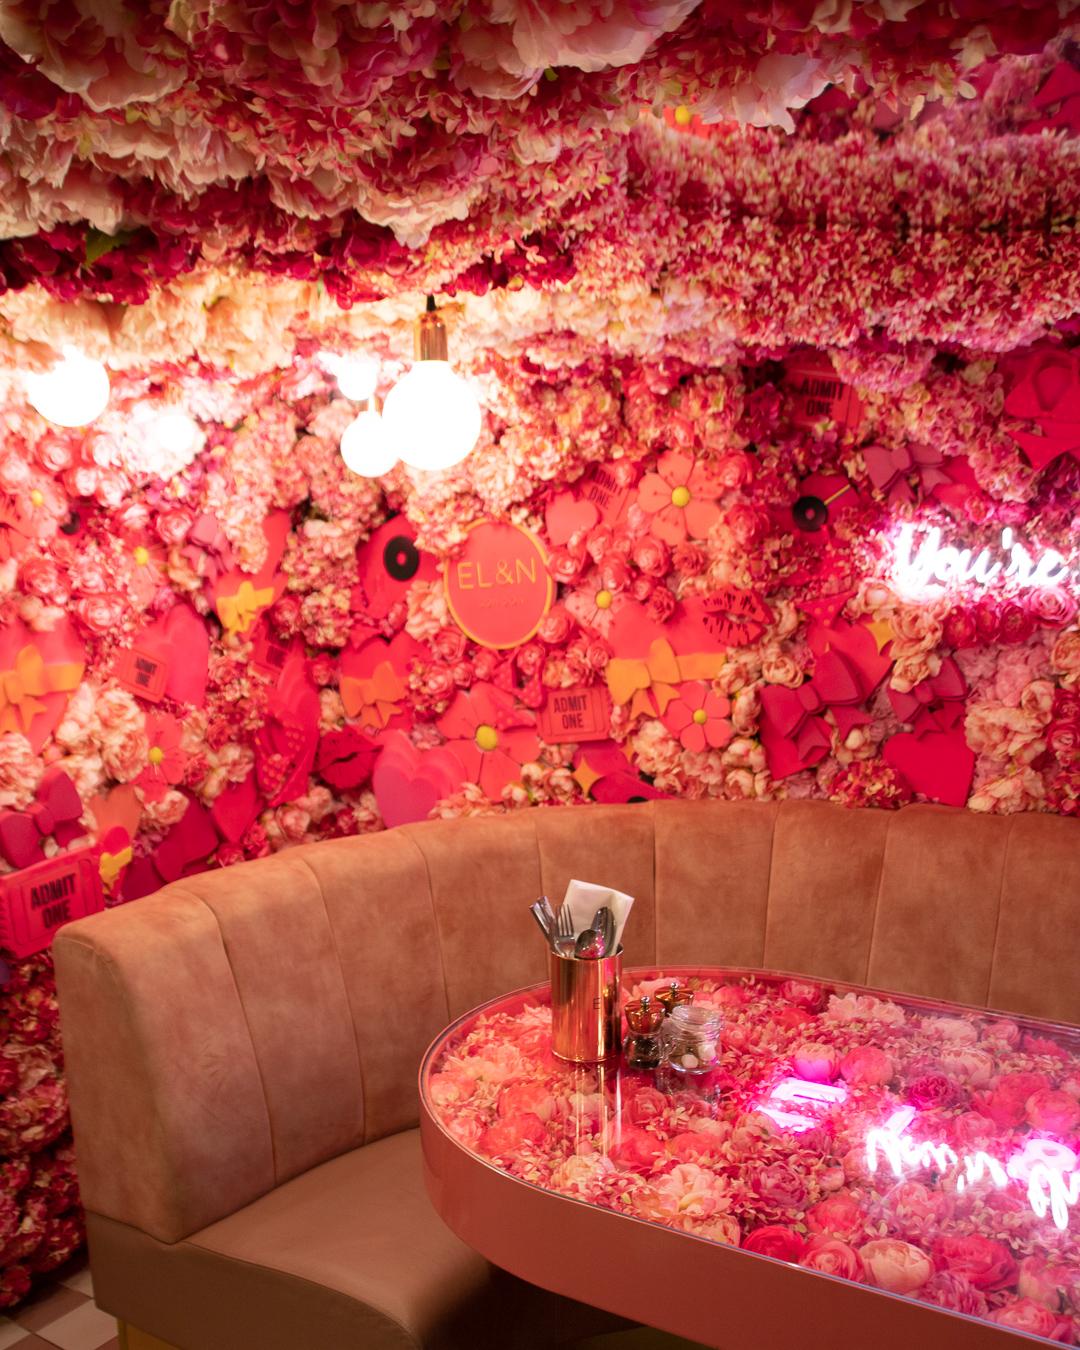 The inside of EL&N Cafe in London